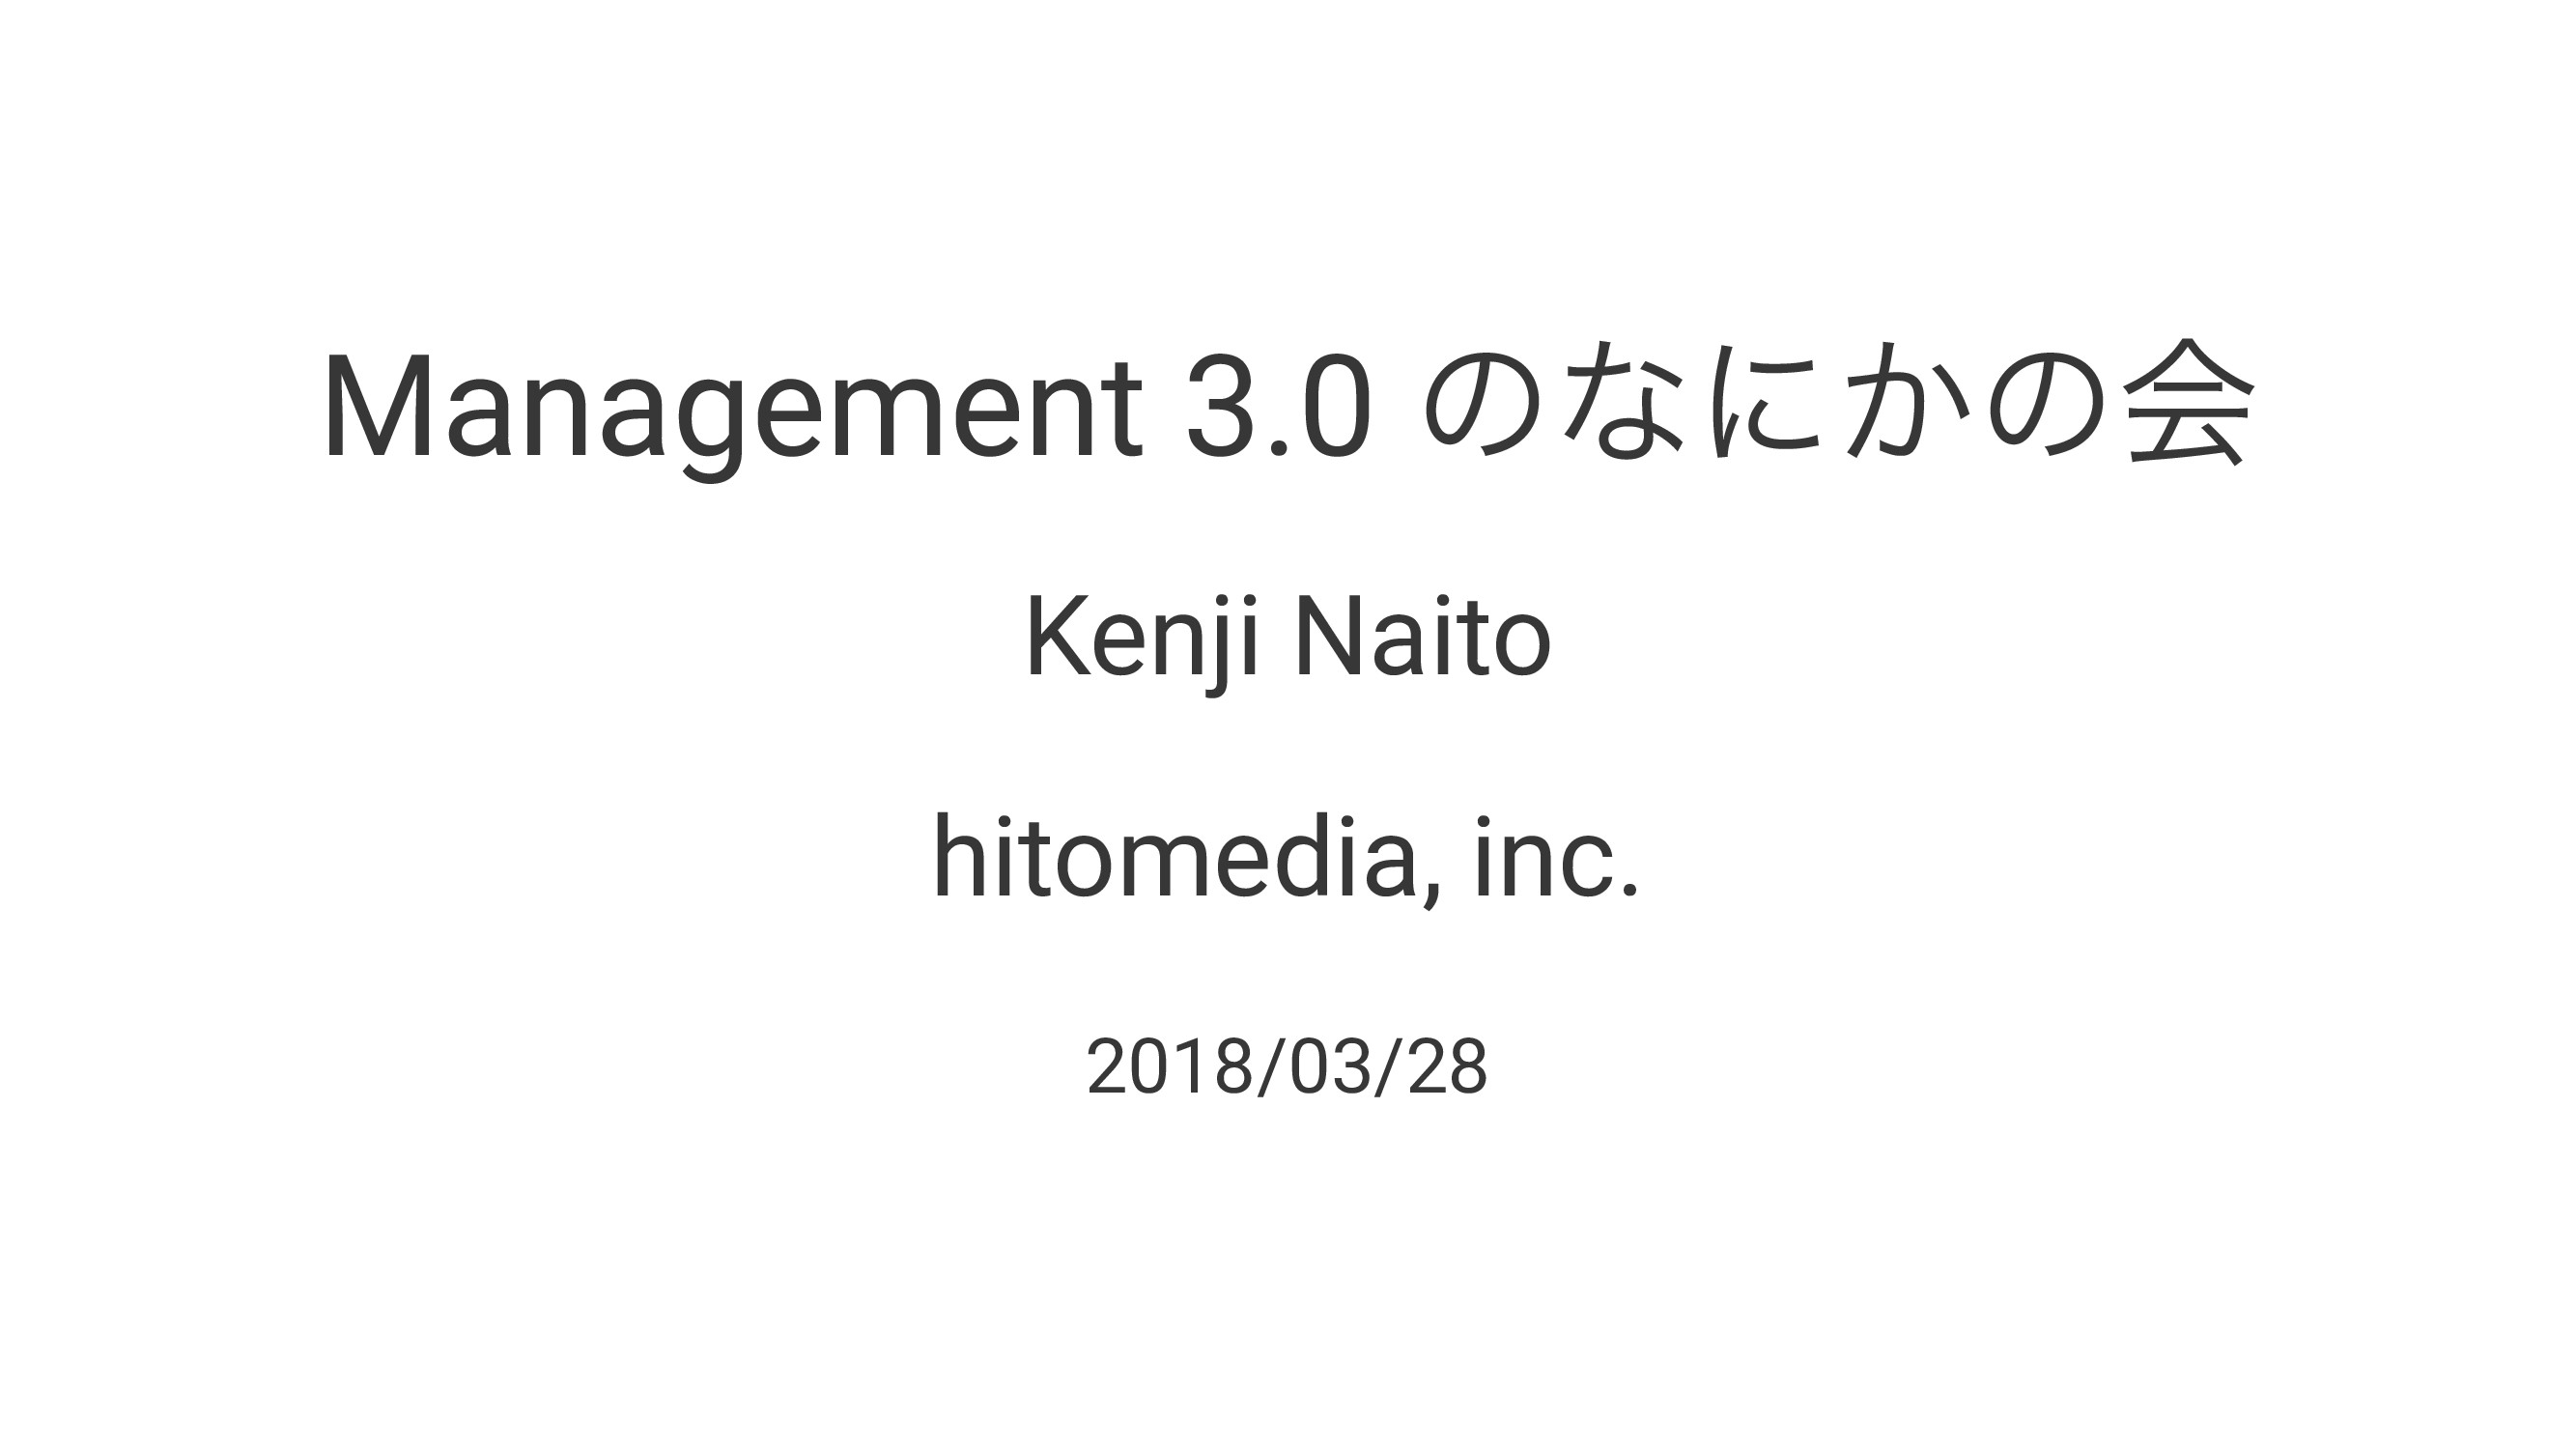 Management 3.0 ͷͳʹ͔ͷձ Kenji Naito hitomedia, in...